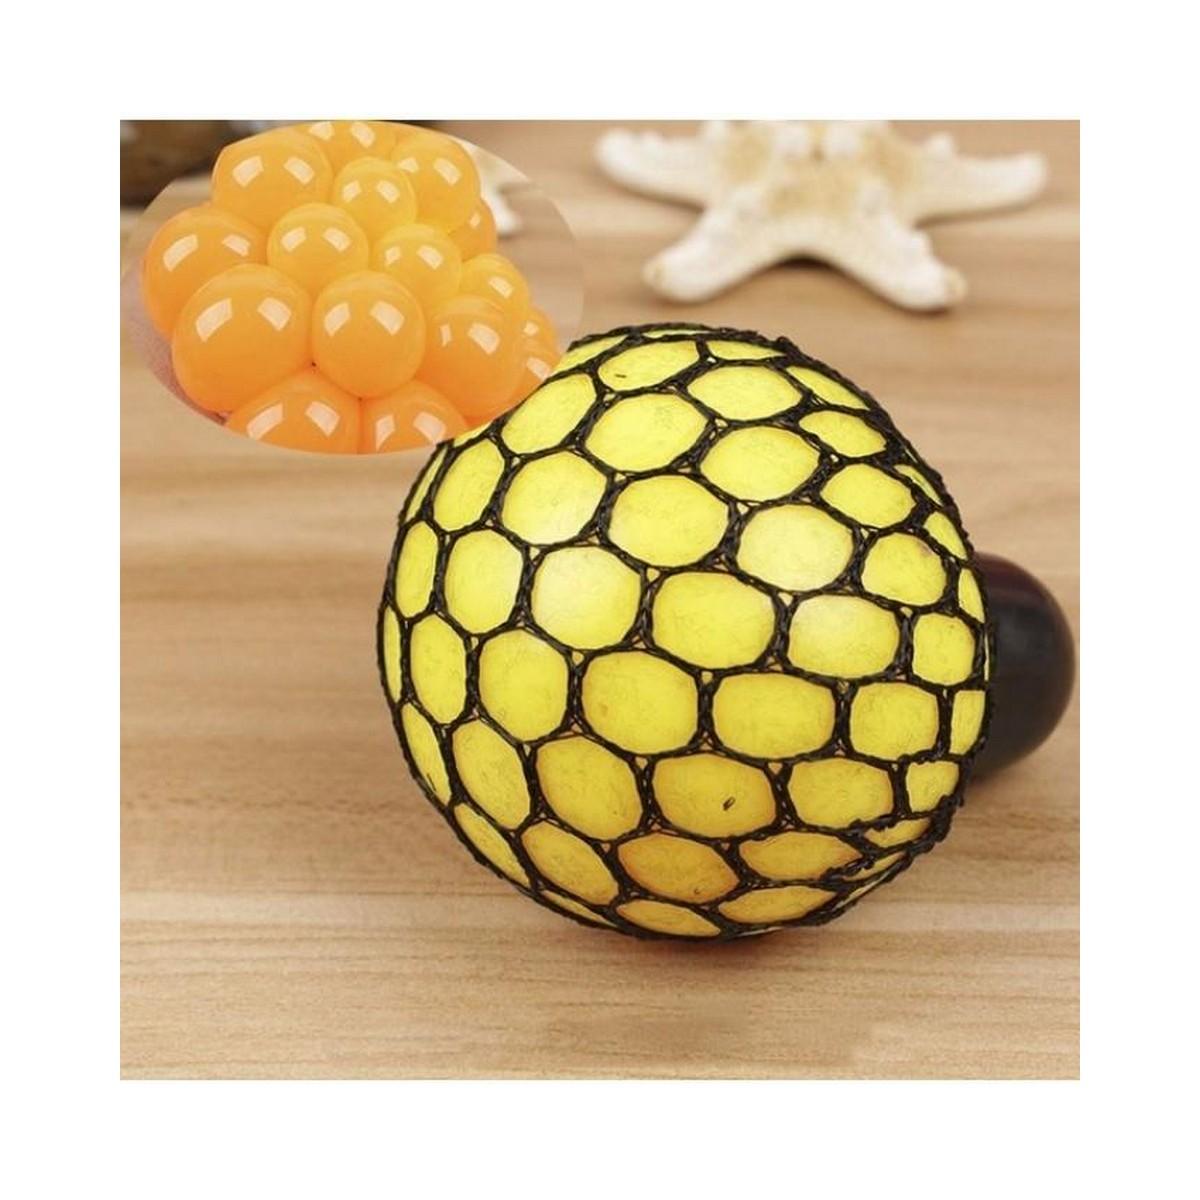 Anti Stress Ball Toy Stress Reliever